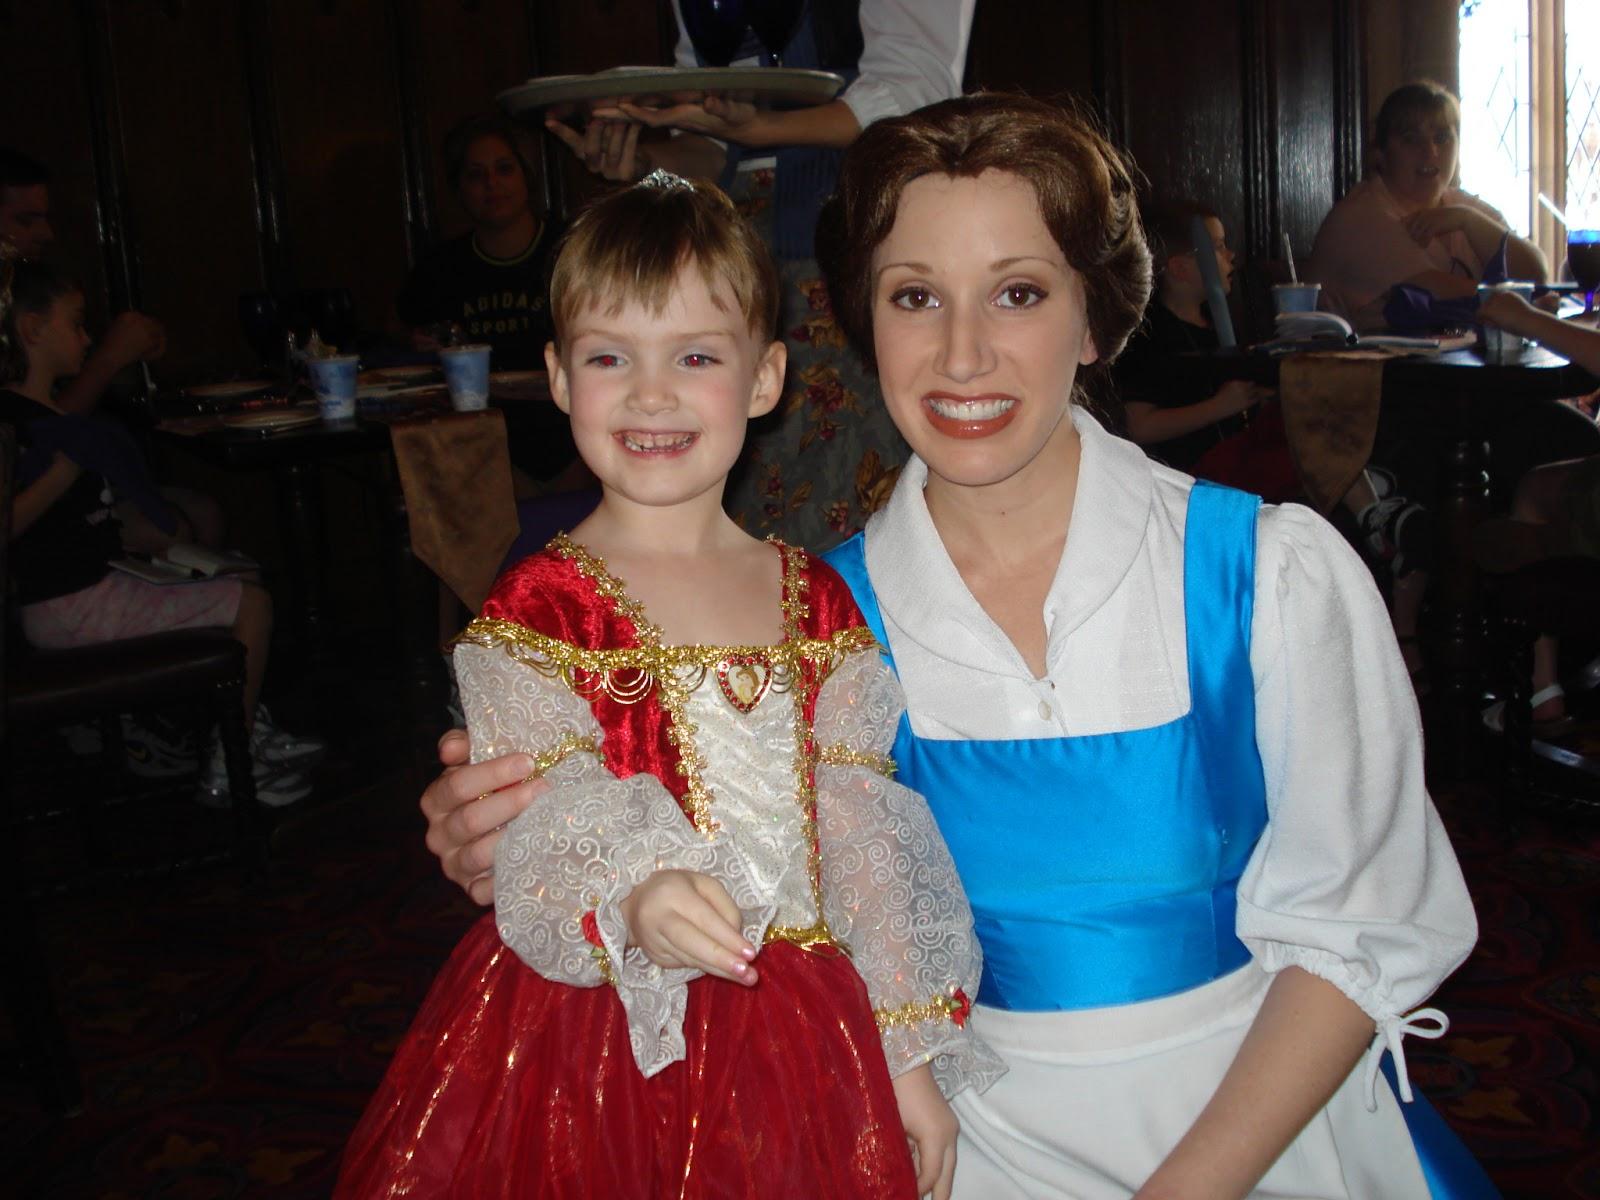 At Cinderella's Royal Table after the Bibbidi Bobbidi Boutique